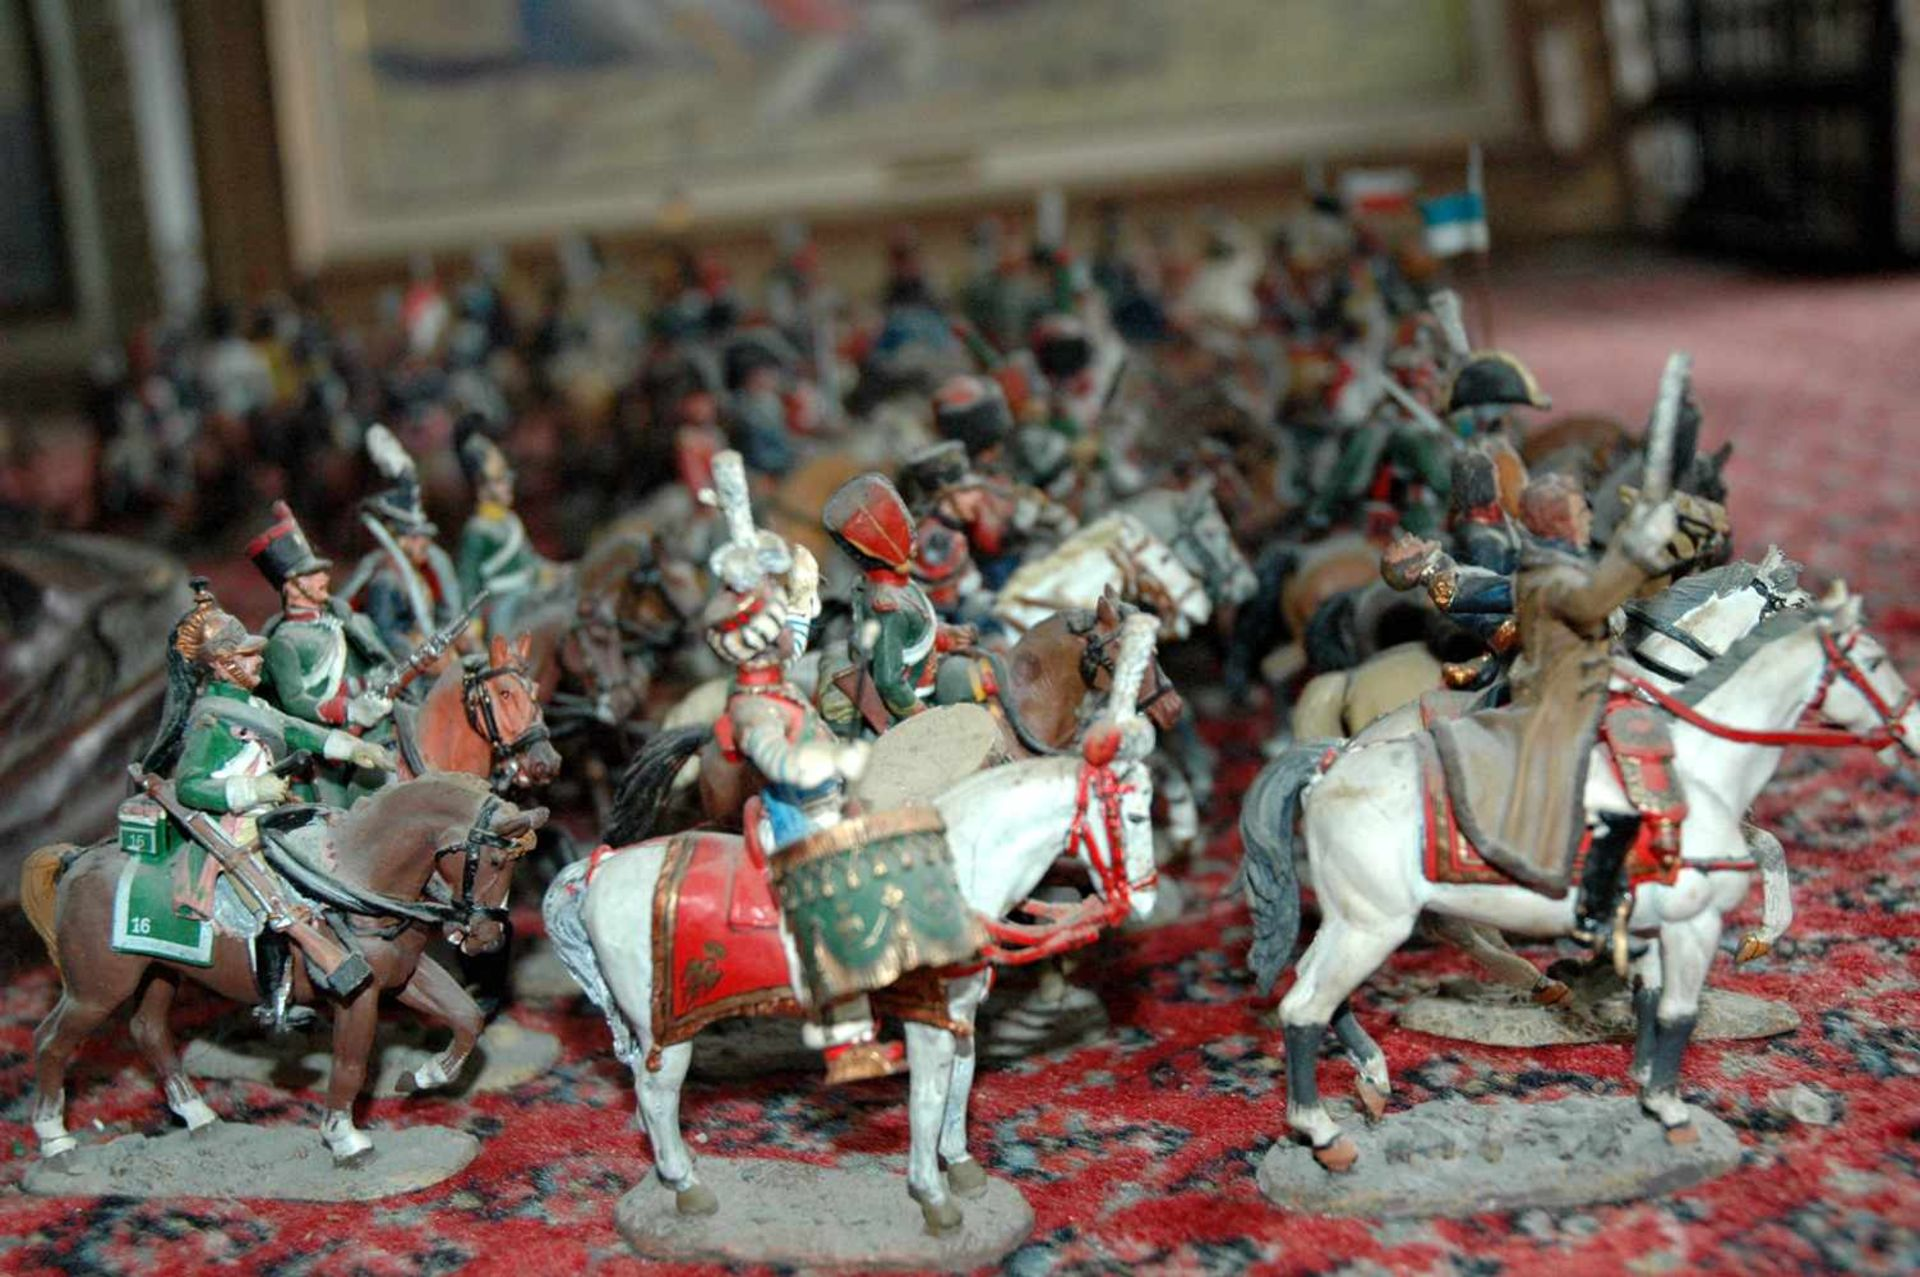 Zinn-Sammelfiguren, delprado: 66 Kavallerie-Figuren, Napoleonische Kriege - Bild 2 aus 4